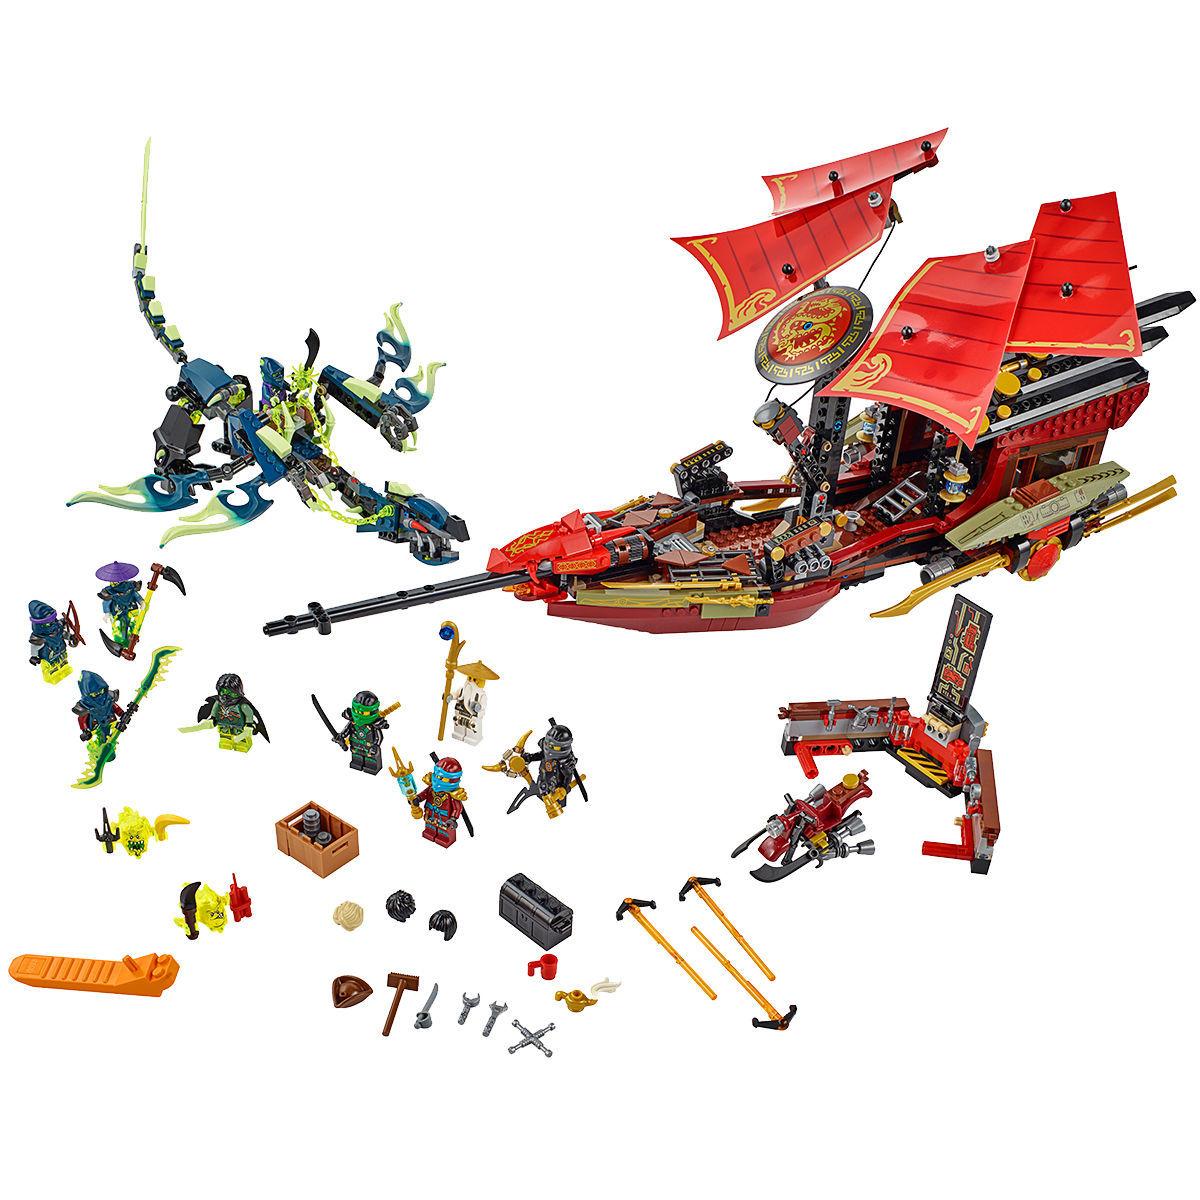 Lego Ninjago 70738 Der letzte Flug des Ninja-Flugseglers für 68,15€ bei [Karstadt]